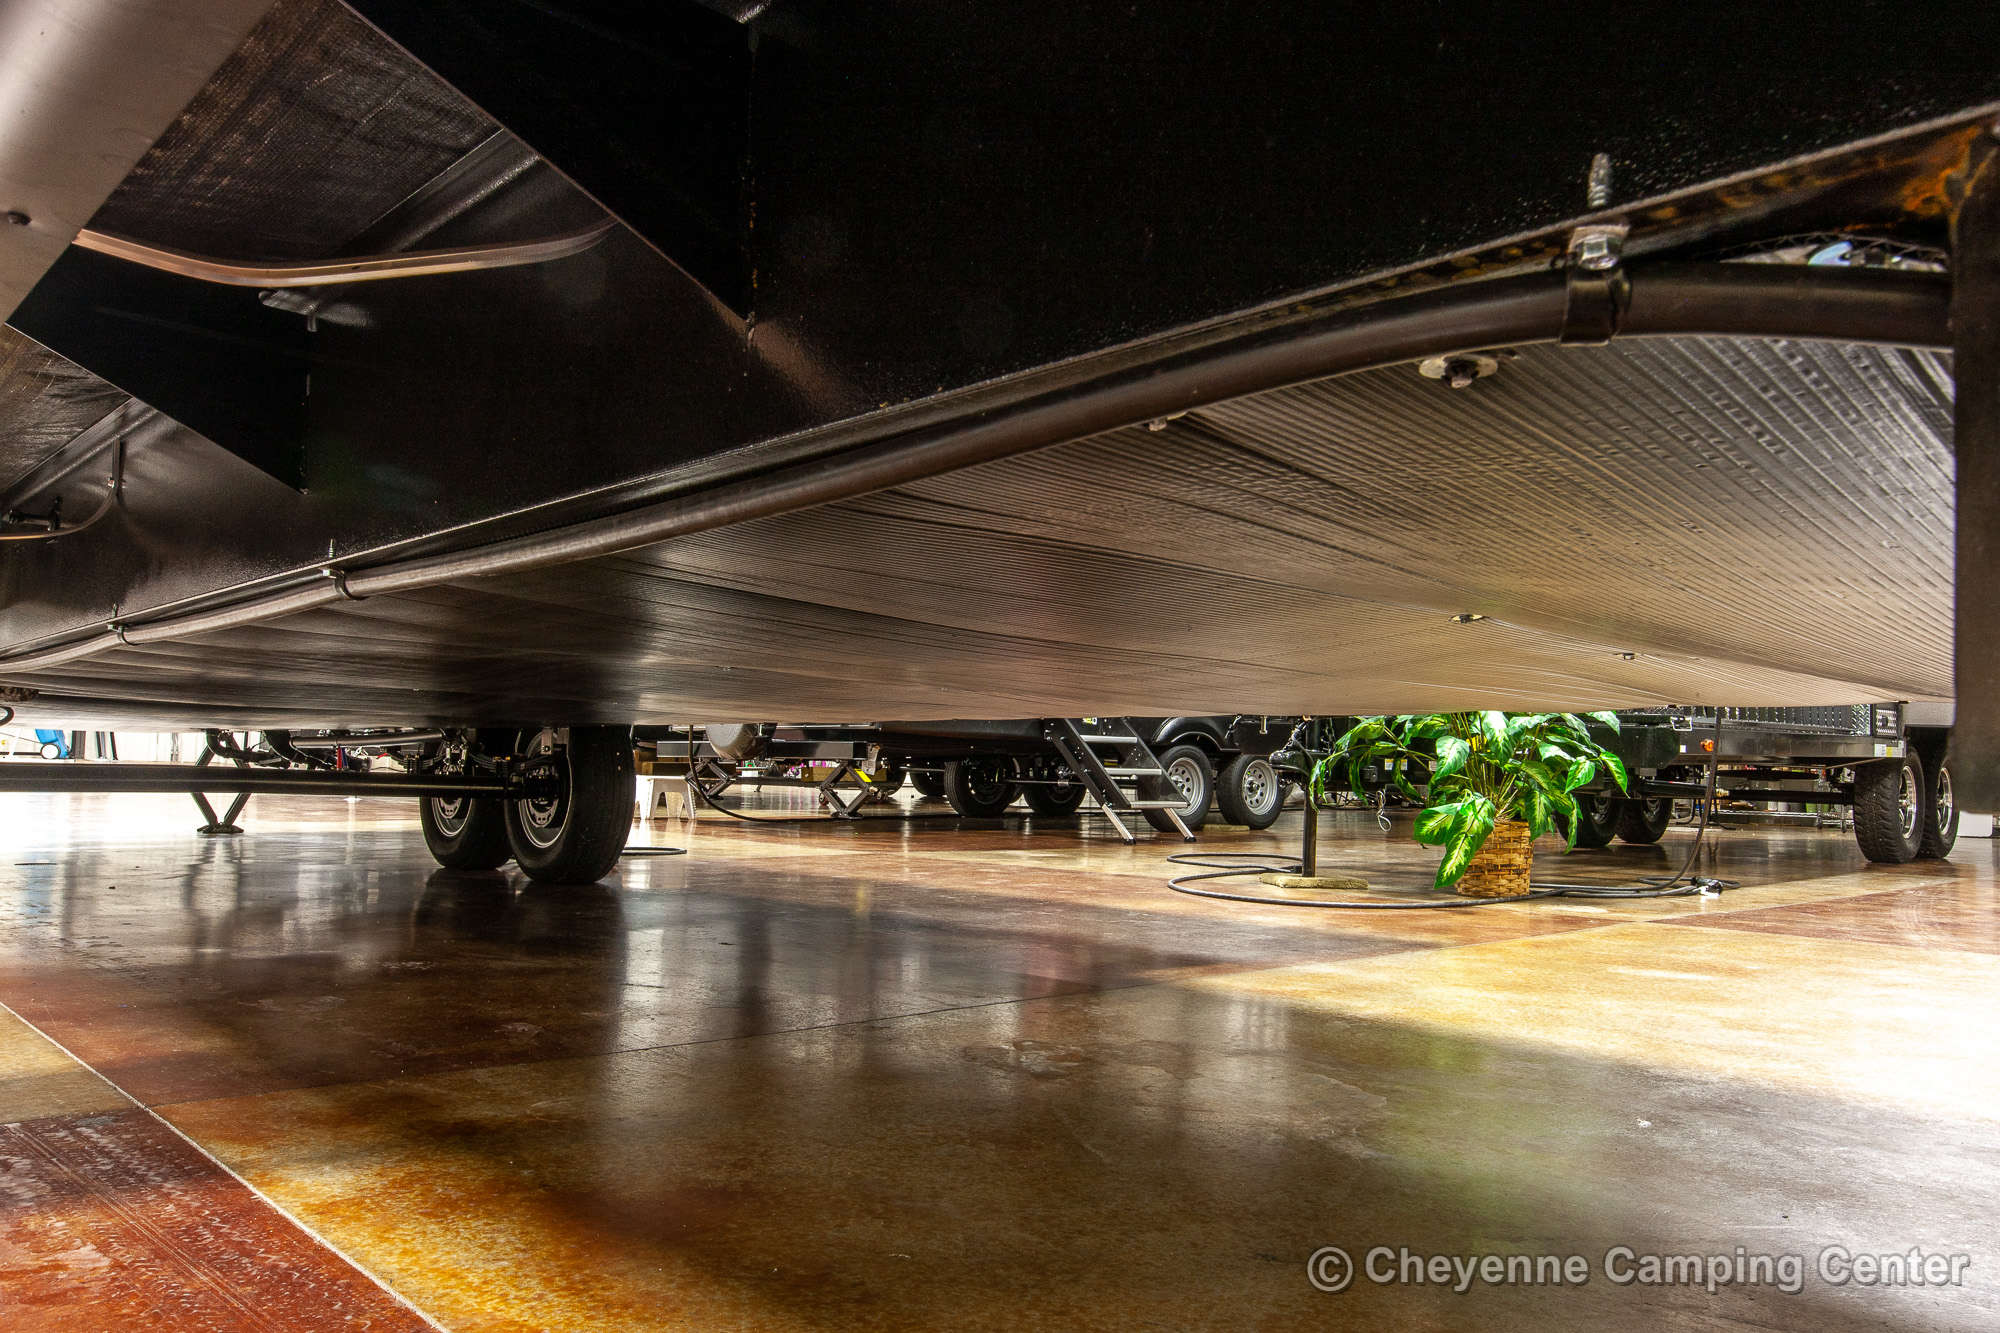 2021 Coachmen Catalina Legacy Edition 323BHDSCK Bunkhouse Travel Trailer Exterior Image